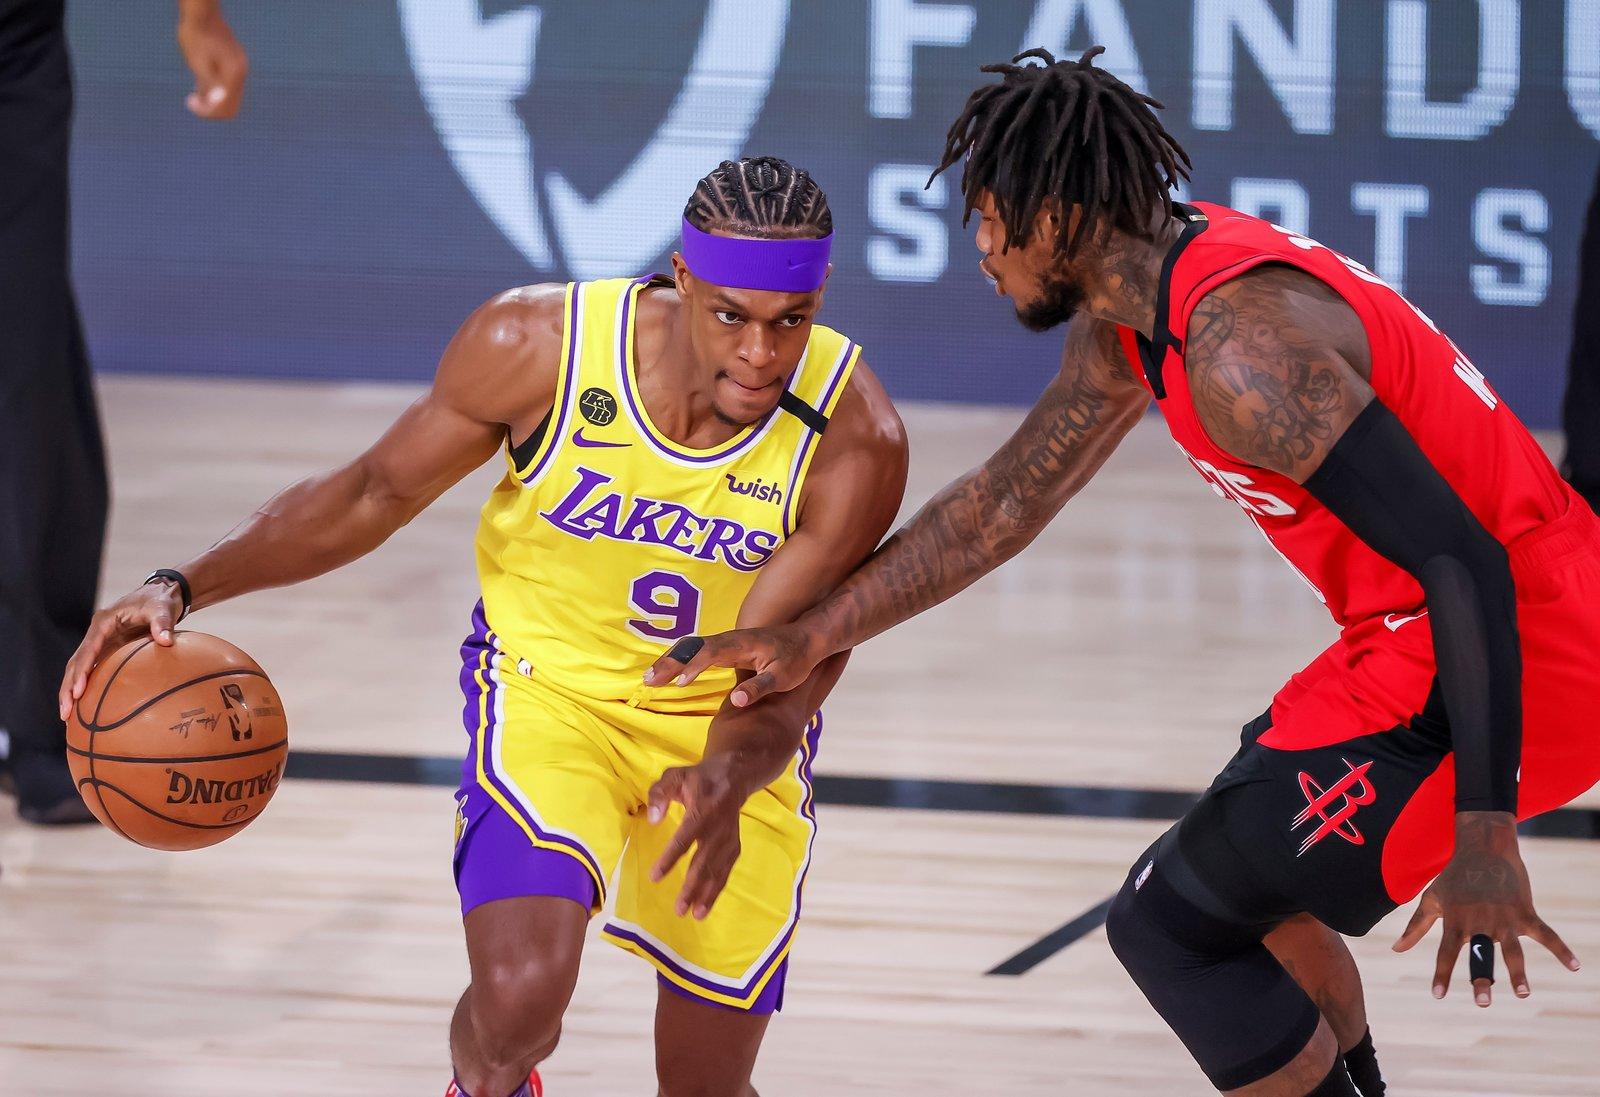 Lakers a un juego de la final